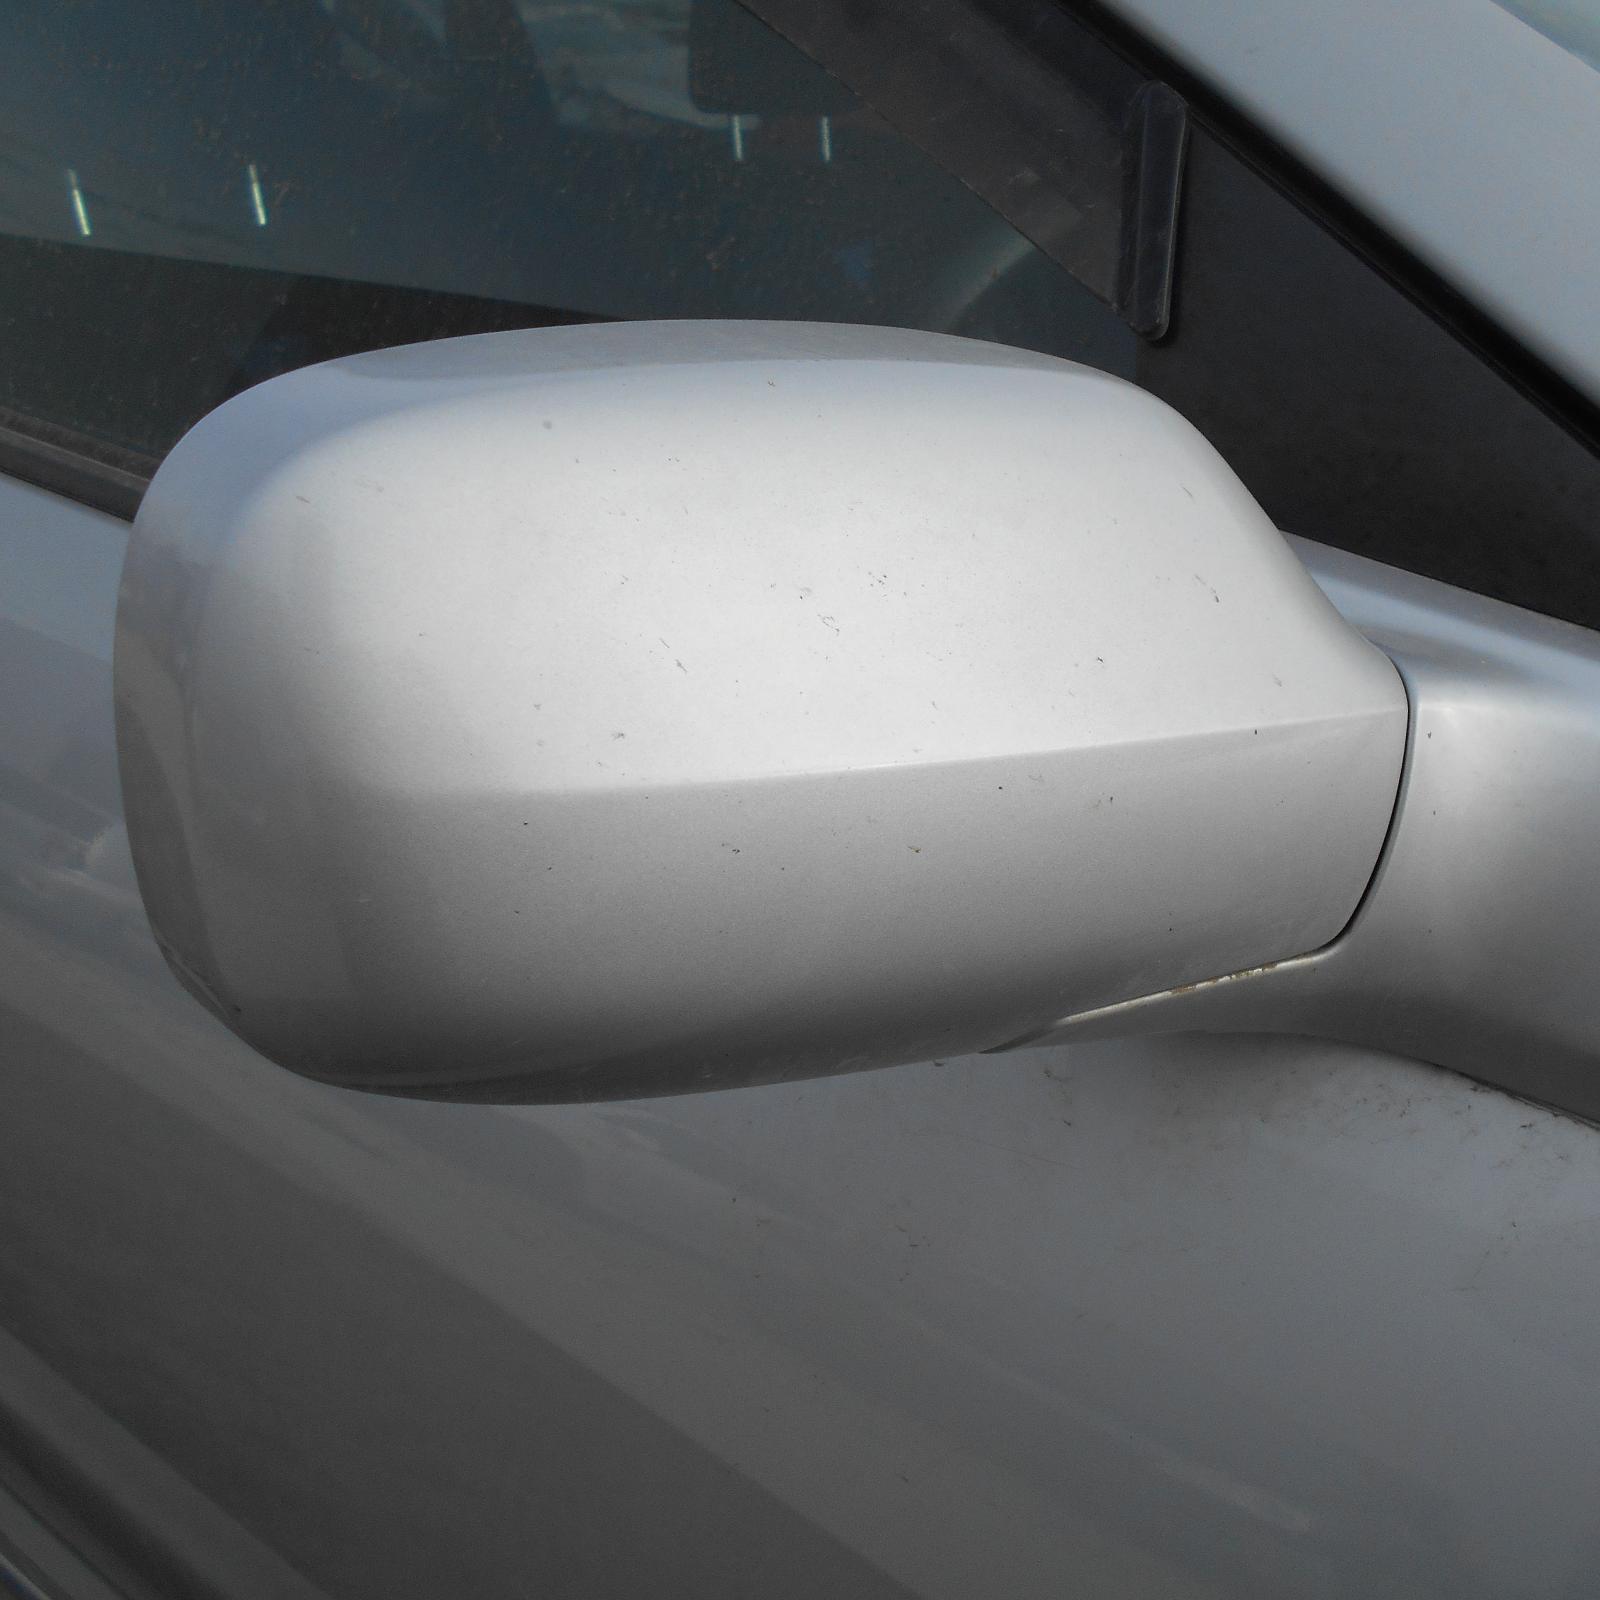 TOYOTA CALDINA, Right Door Mirror, T240, 7 WIRE TYPE, 09/02-06/07 (IMPORT)